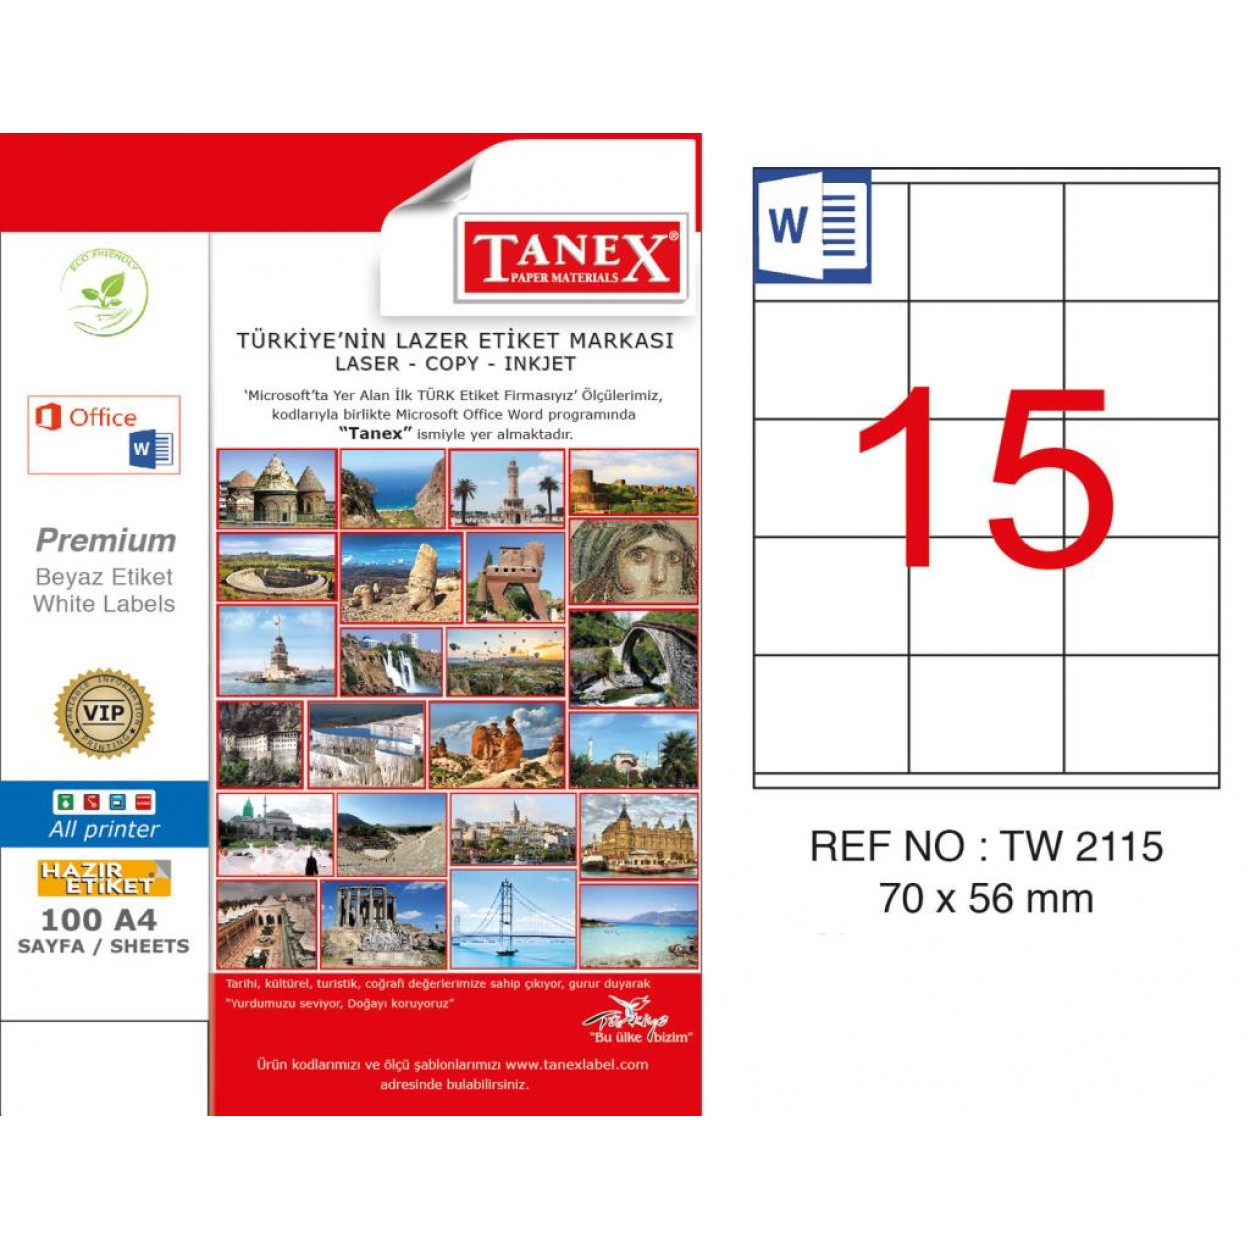 Tanex TW-2115 70x56mm Kuşe Laser Etiket 100 Lü Paket